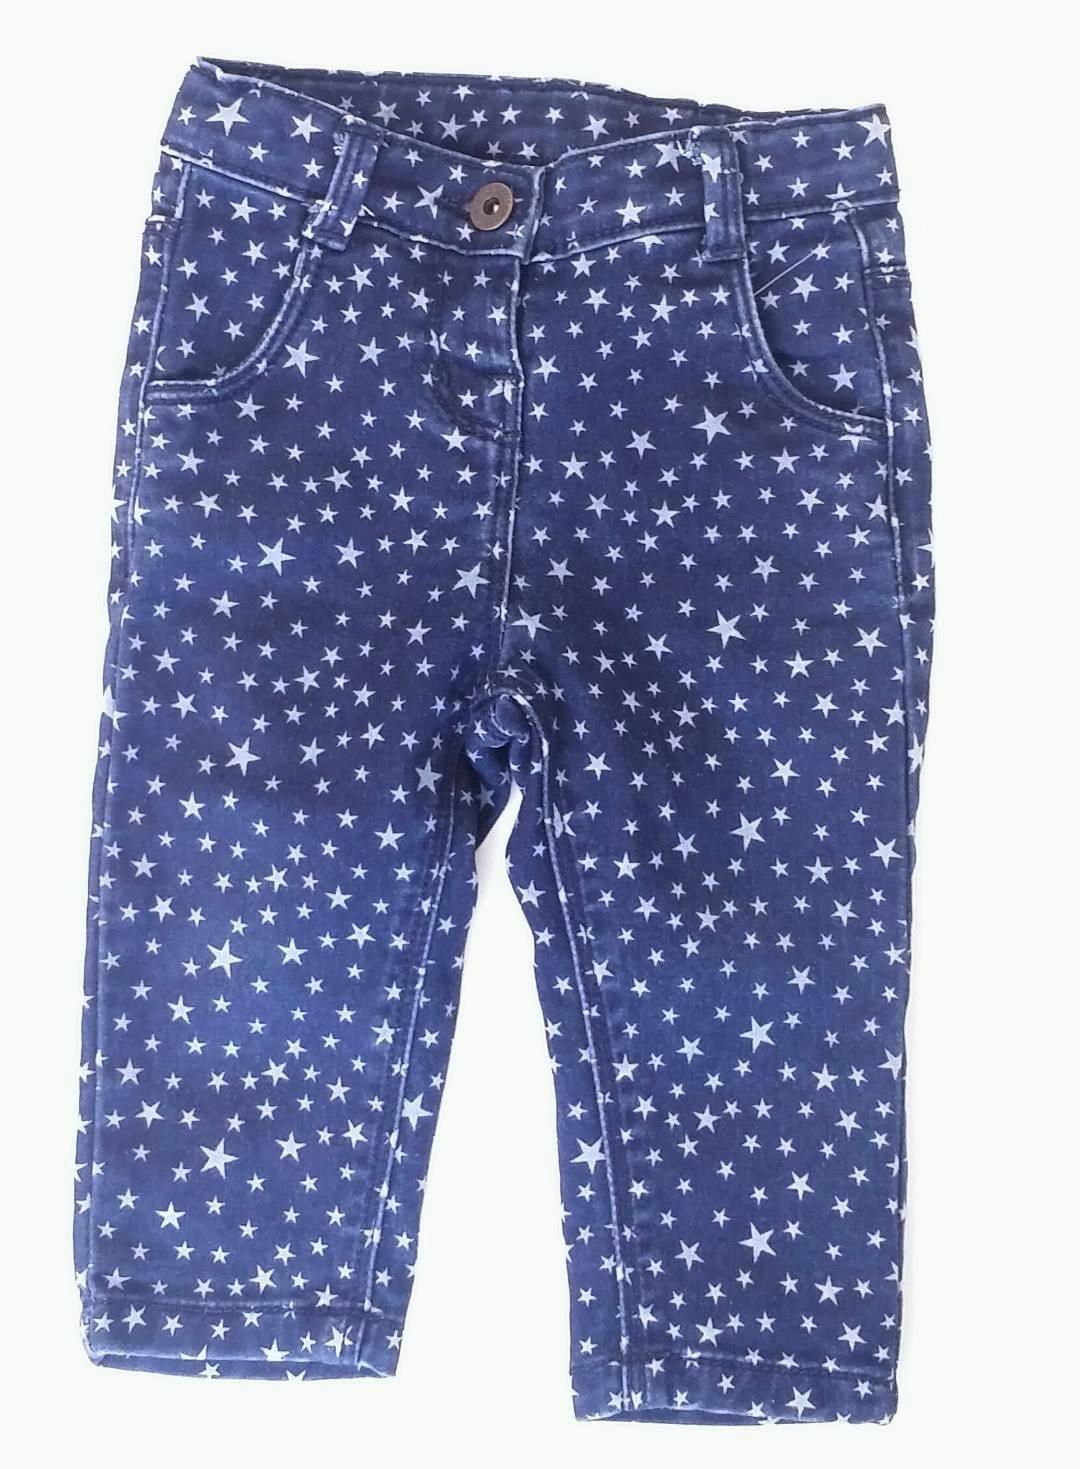 6-12-MONTHS-Star-Print-Stretch-Jeans_2063369A.jpg